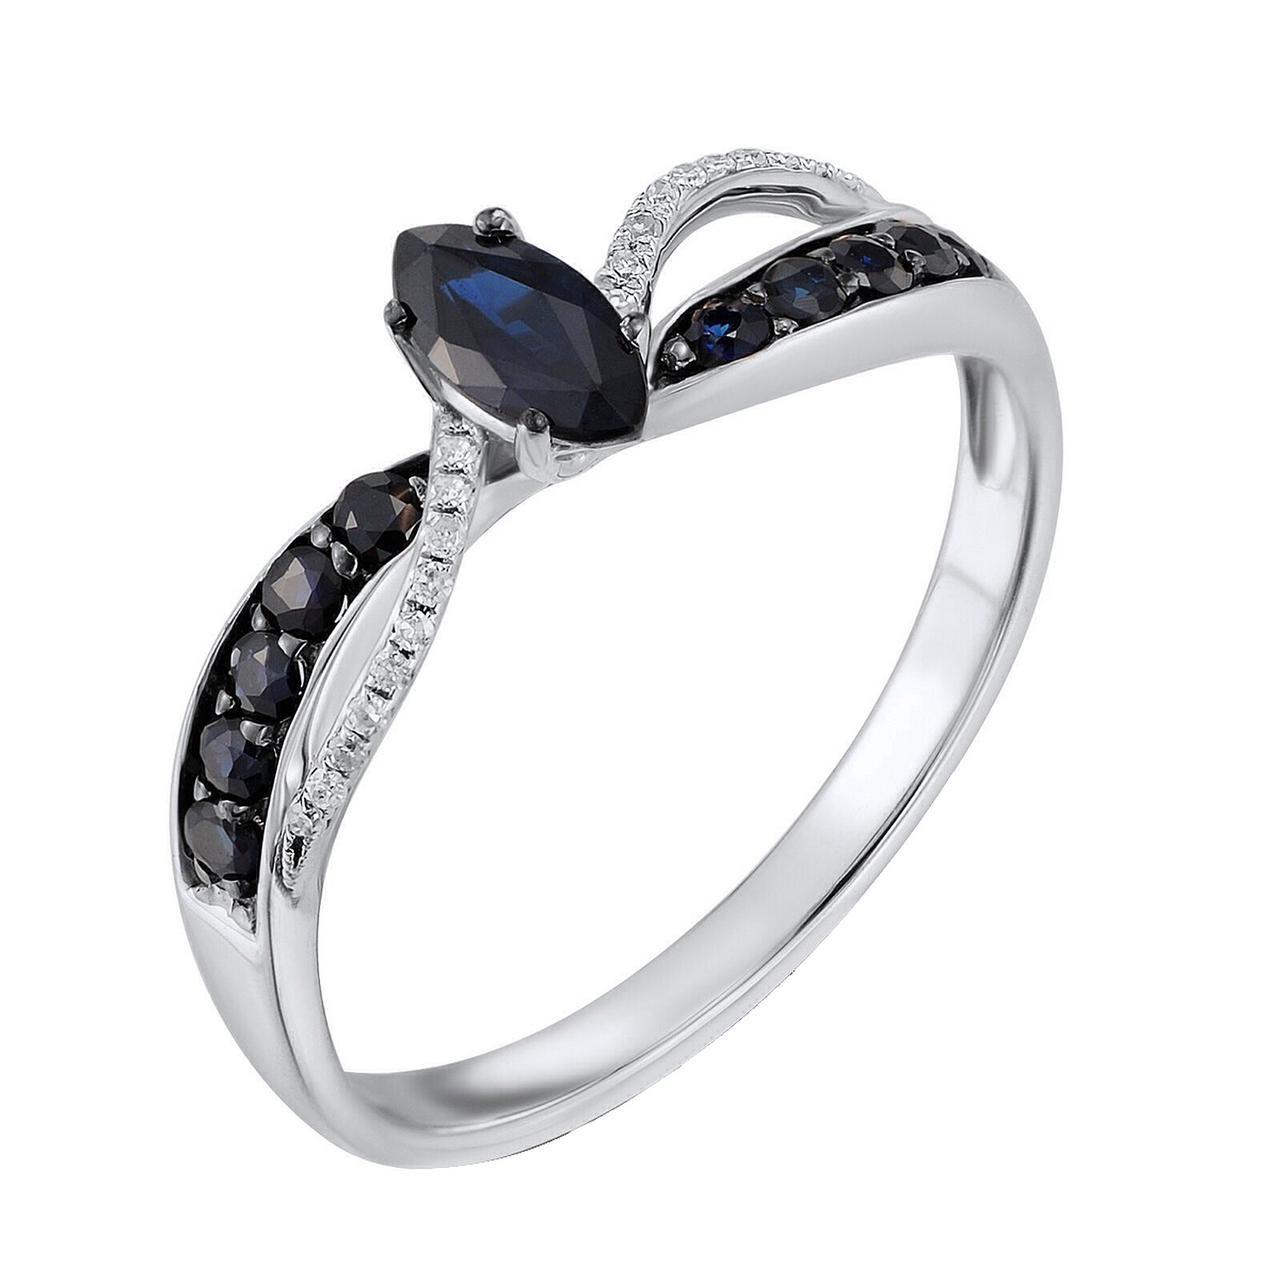 Золотое кольцо с бриллиантами и сапфирами, размер 17 (479163)